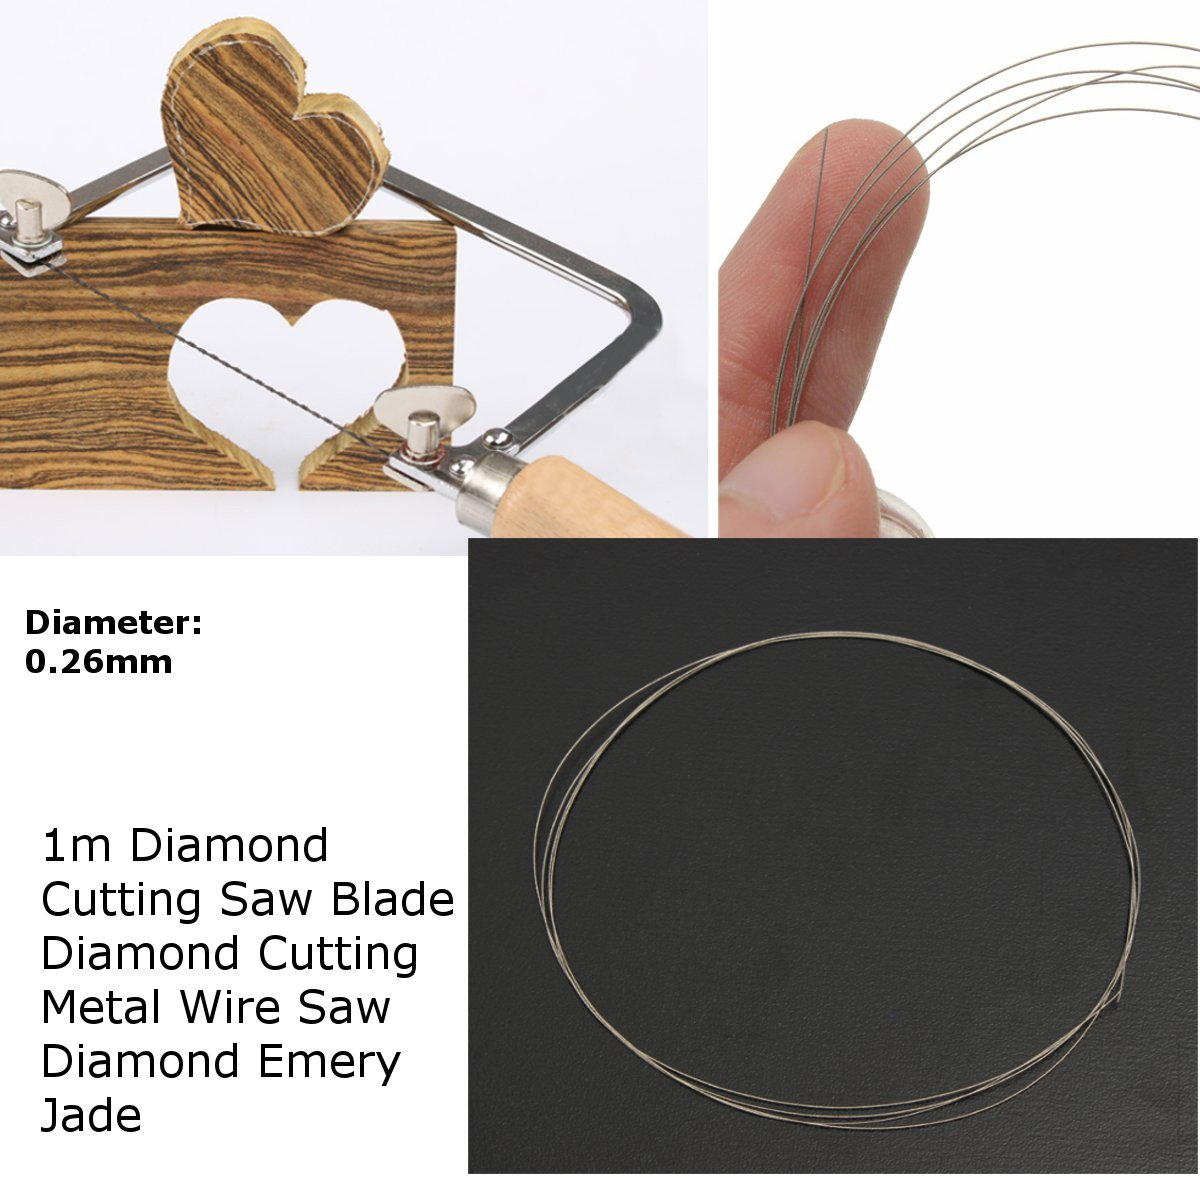 1M Saw Blades Cutting Wire DIY Diamond Cut Wire For Emery Jade Metal Stone Glass Rock Marble Granite Wire Saw Blade Cutting Tool